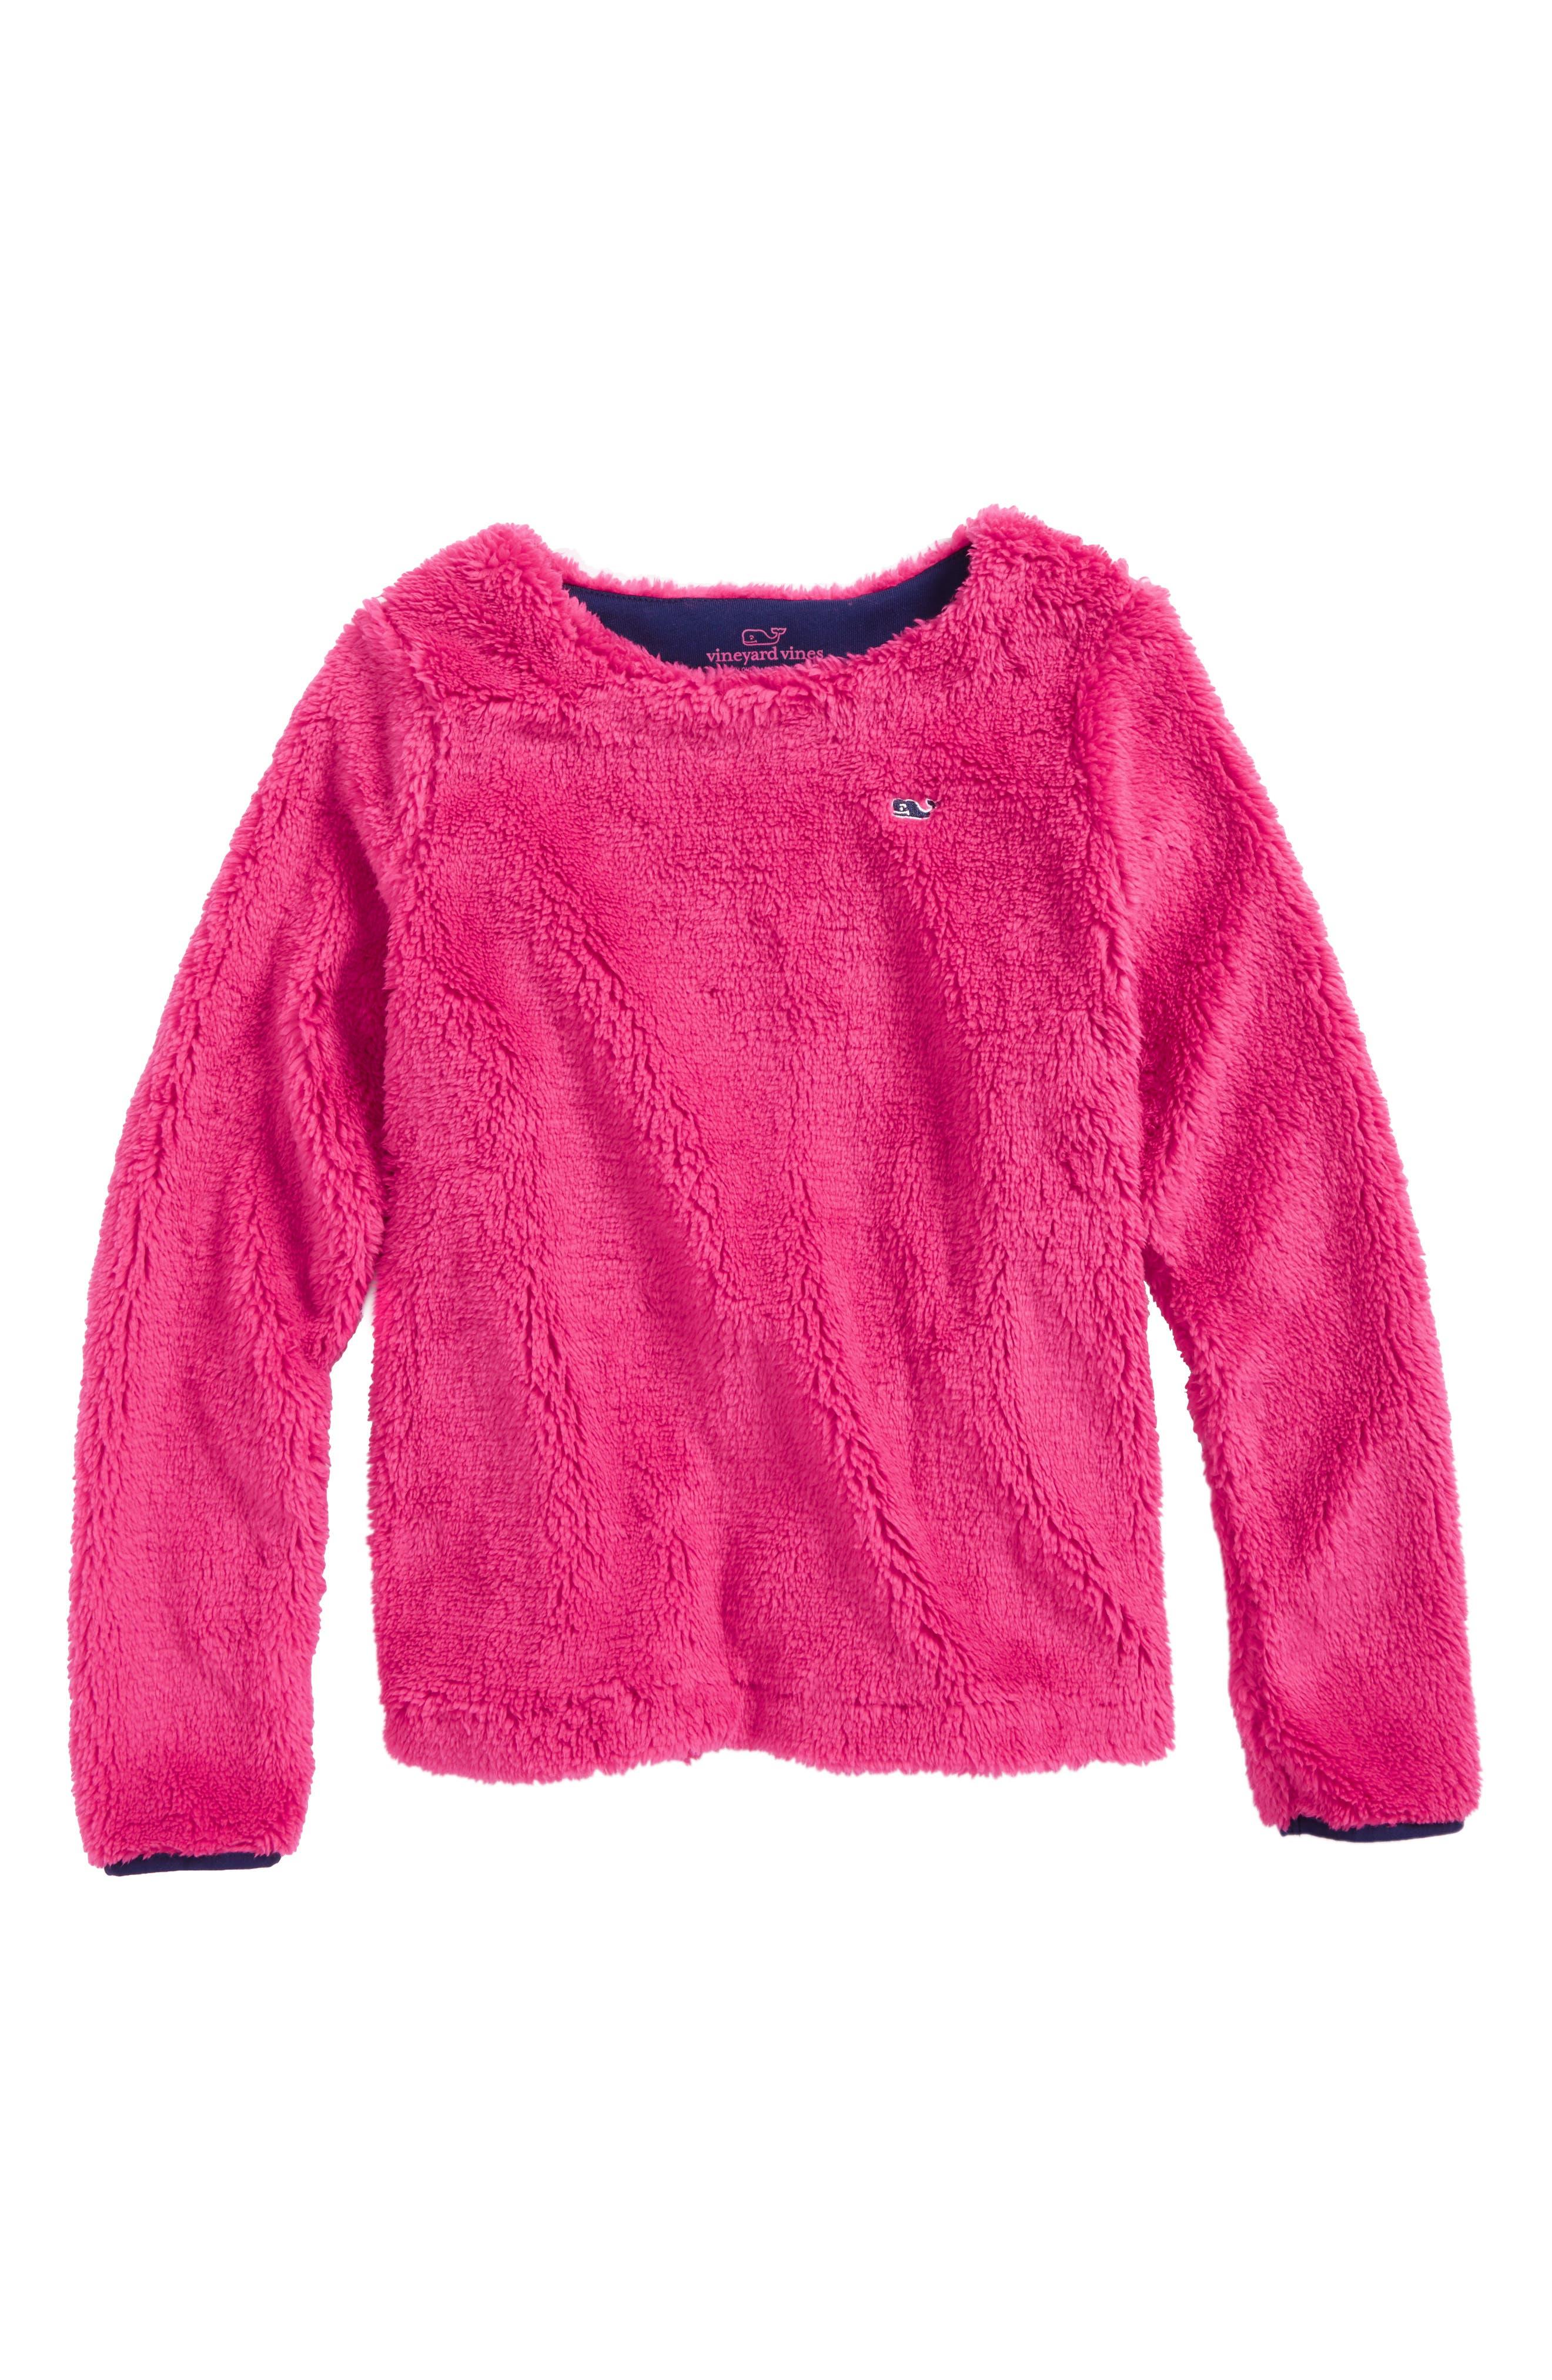 vineyard vines Fuzzy Sweatshirt (Little Girls & Big Girls)